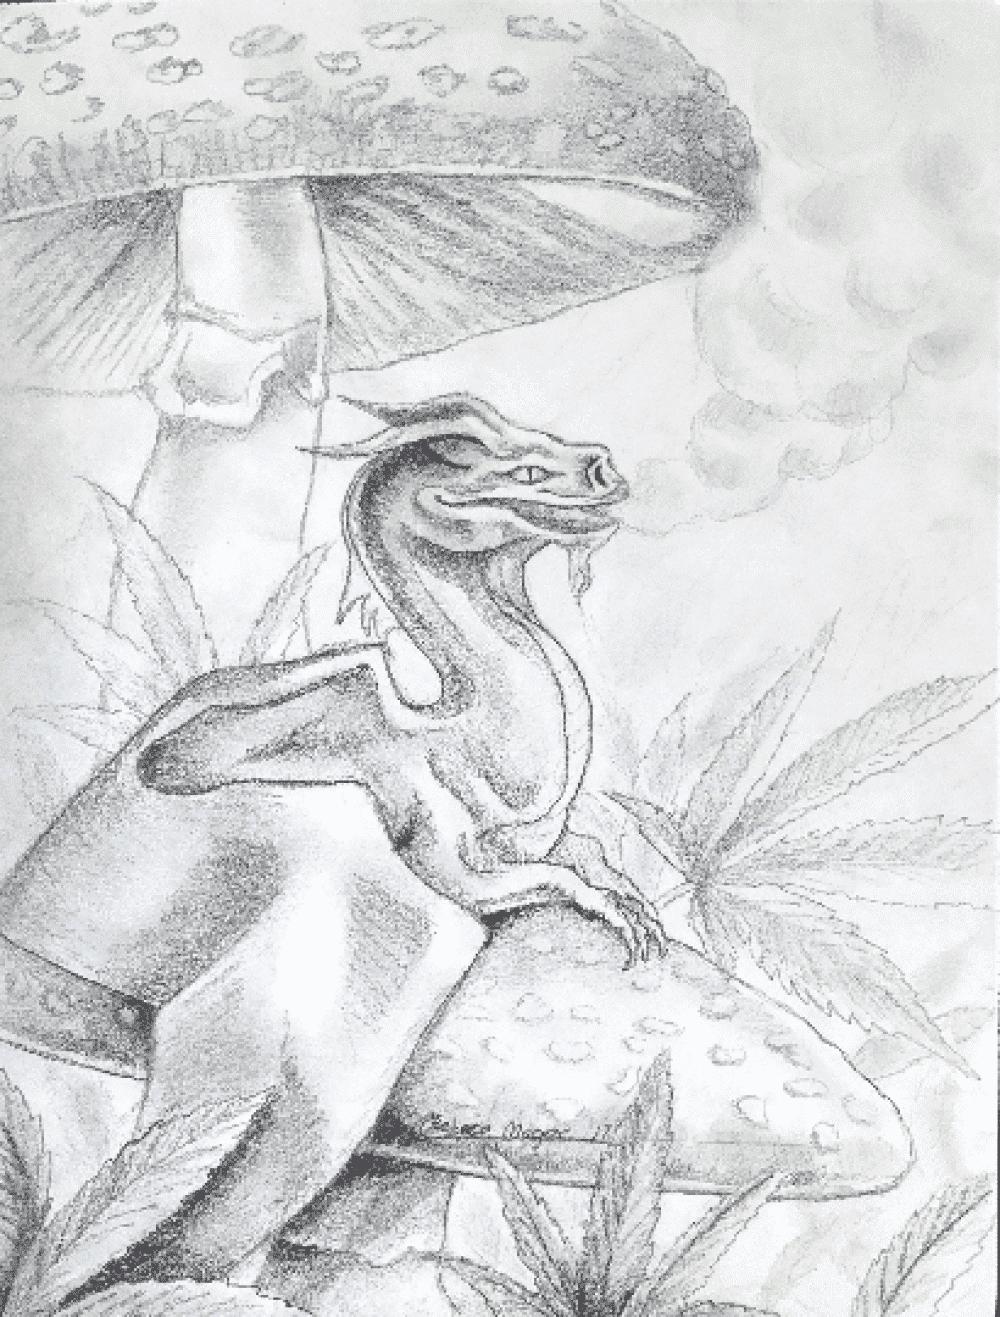 Tiny Dragon Sketch